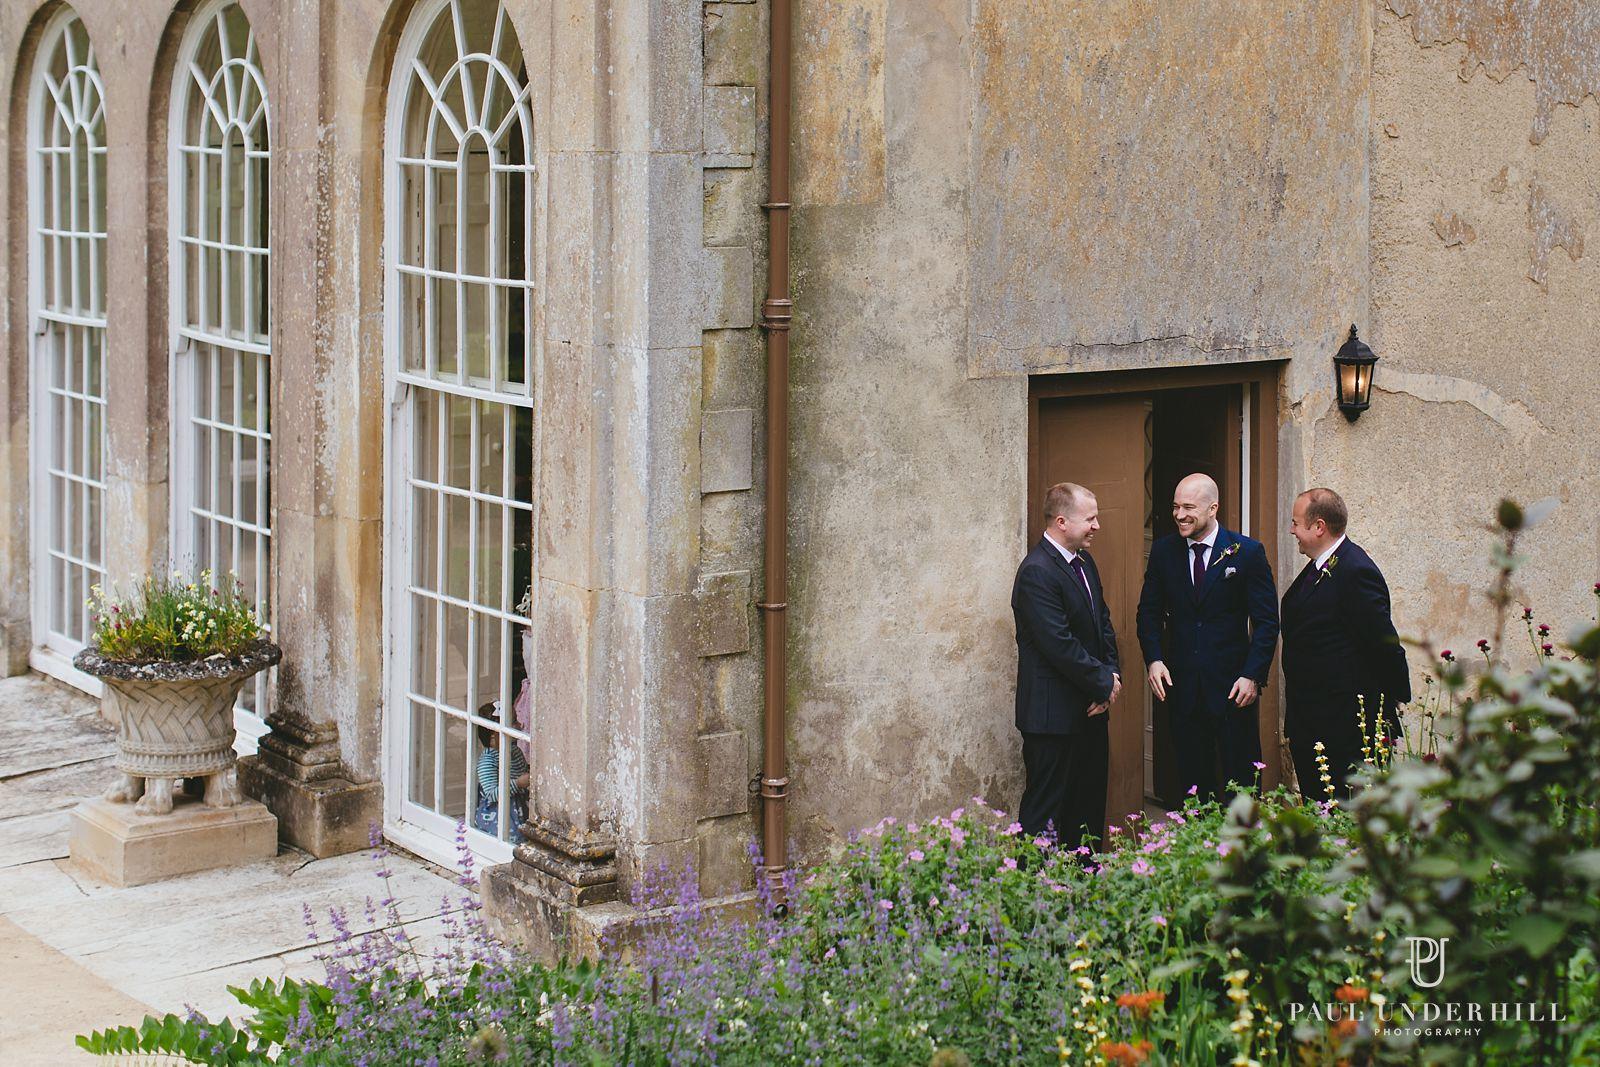 Orangery suite Sherborne castle